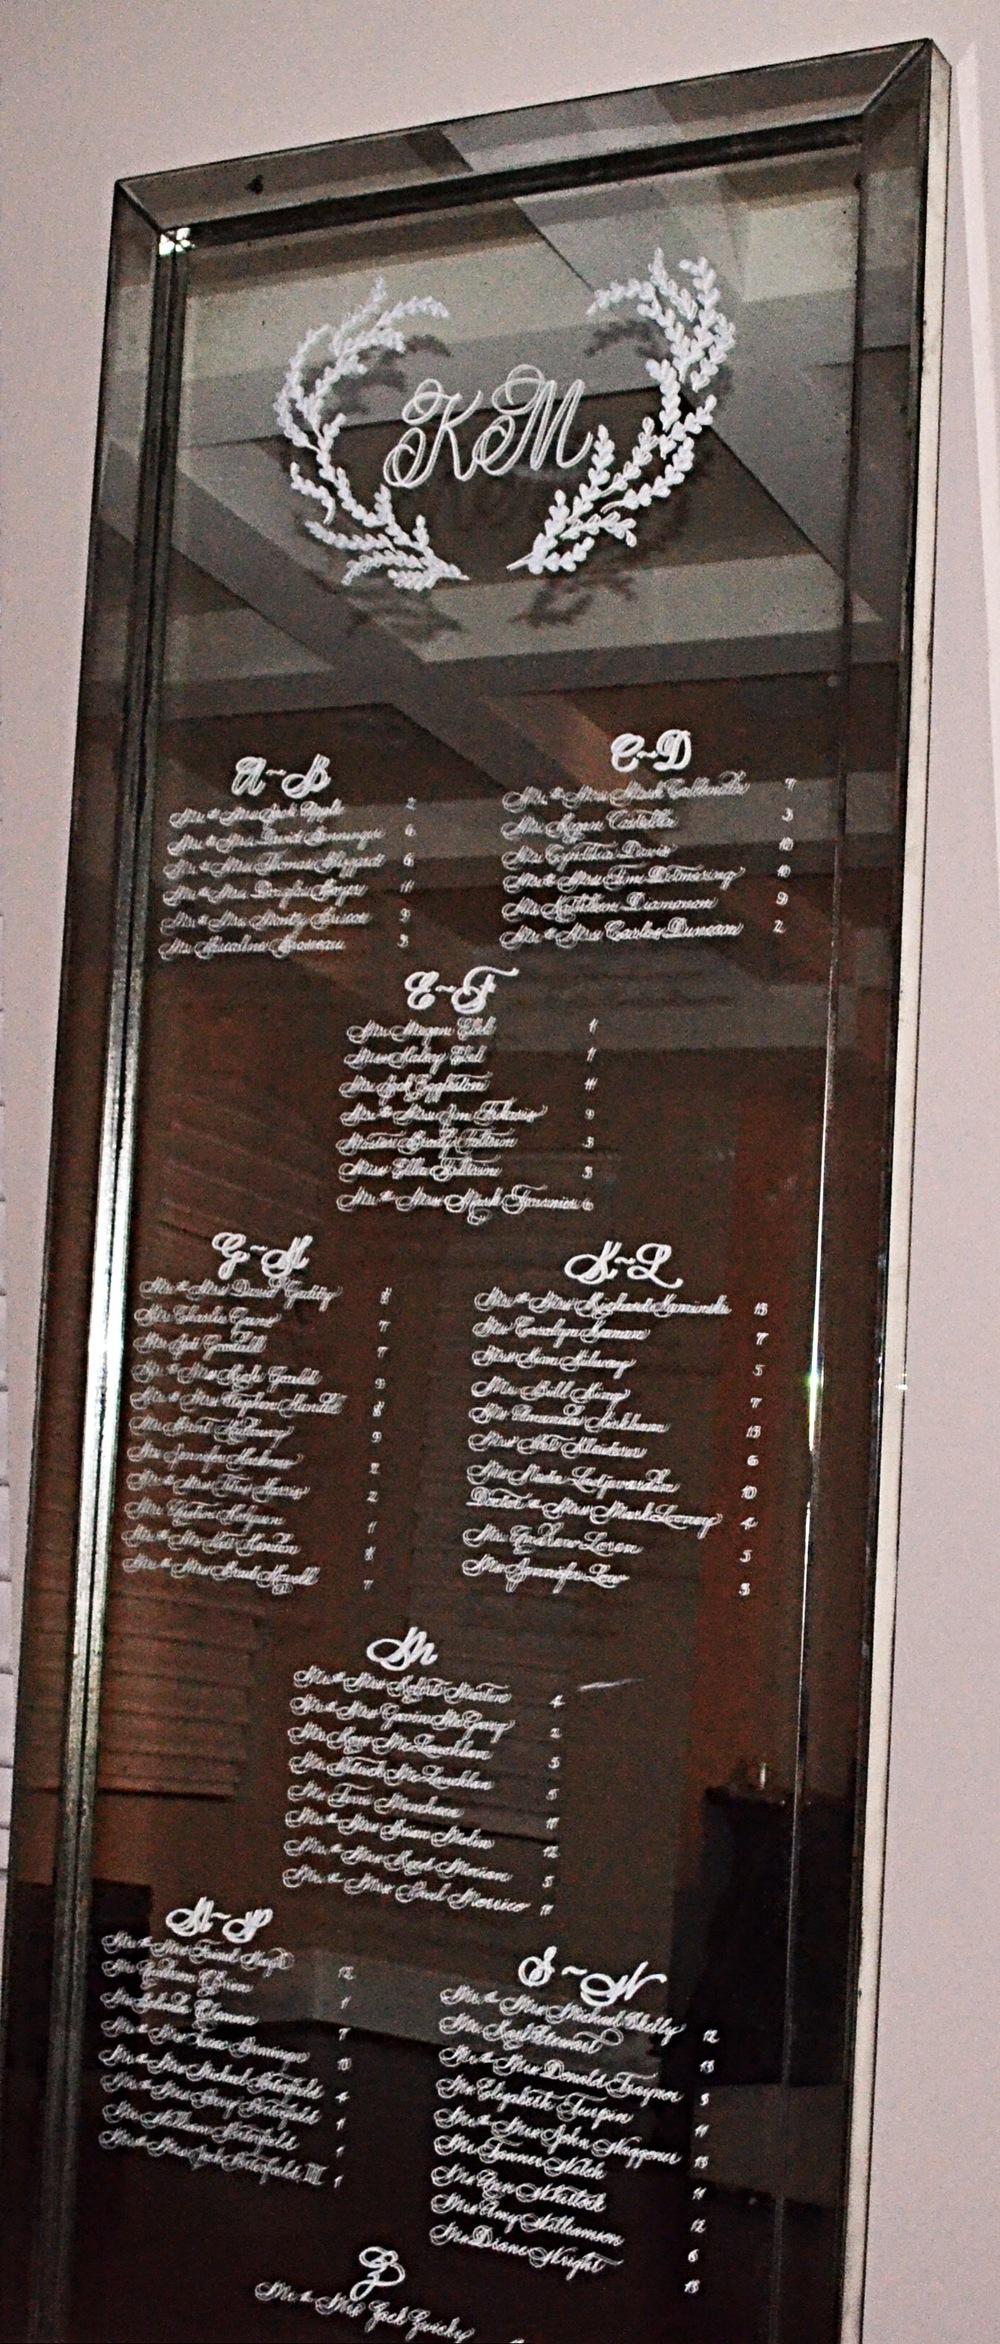 Houston Calligraphy Mirror Seating Chart 3.JPG